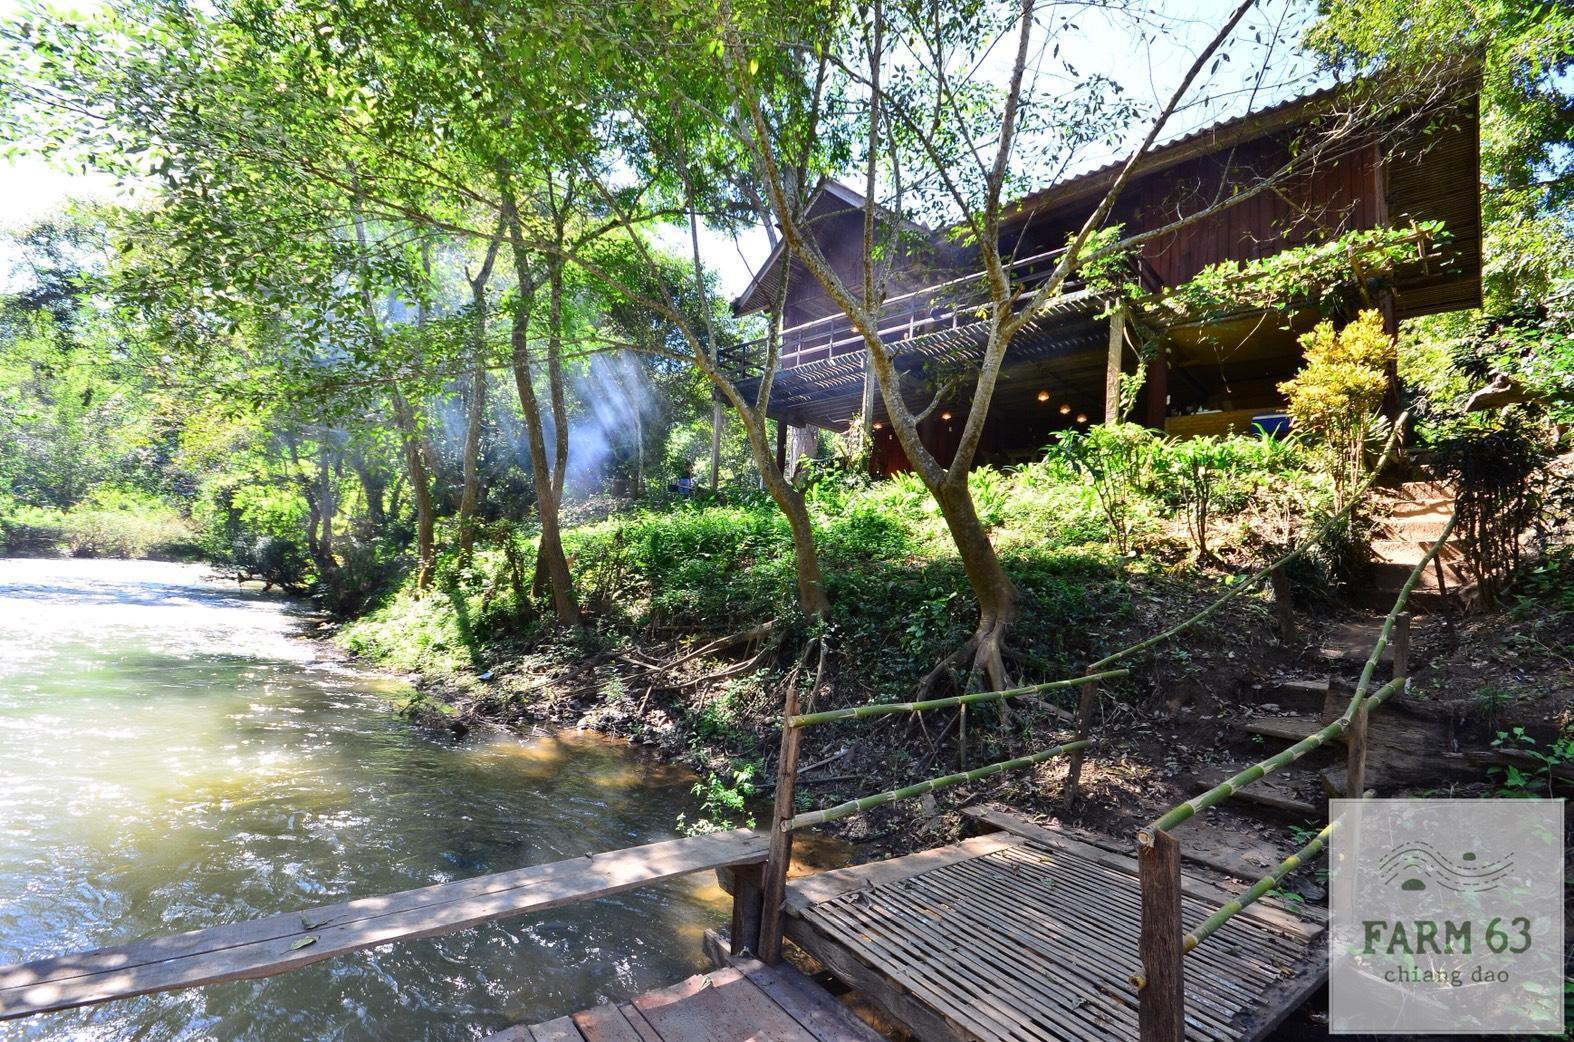 Farm63 Chiang Dao Riverfront Home บ้านเดี่ยว 1 ห้องนอน 2 ห้องน้ำส่วนตัว ขนาด 200 ตร.ม. – แม่นา